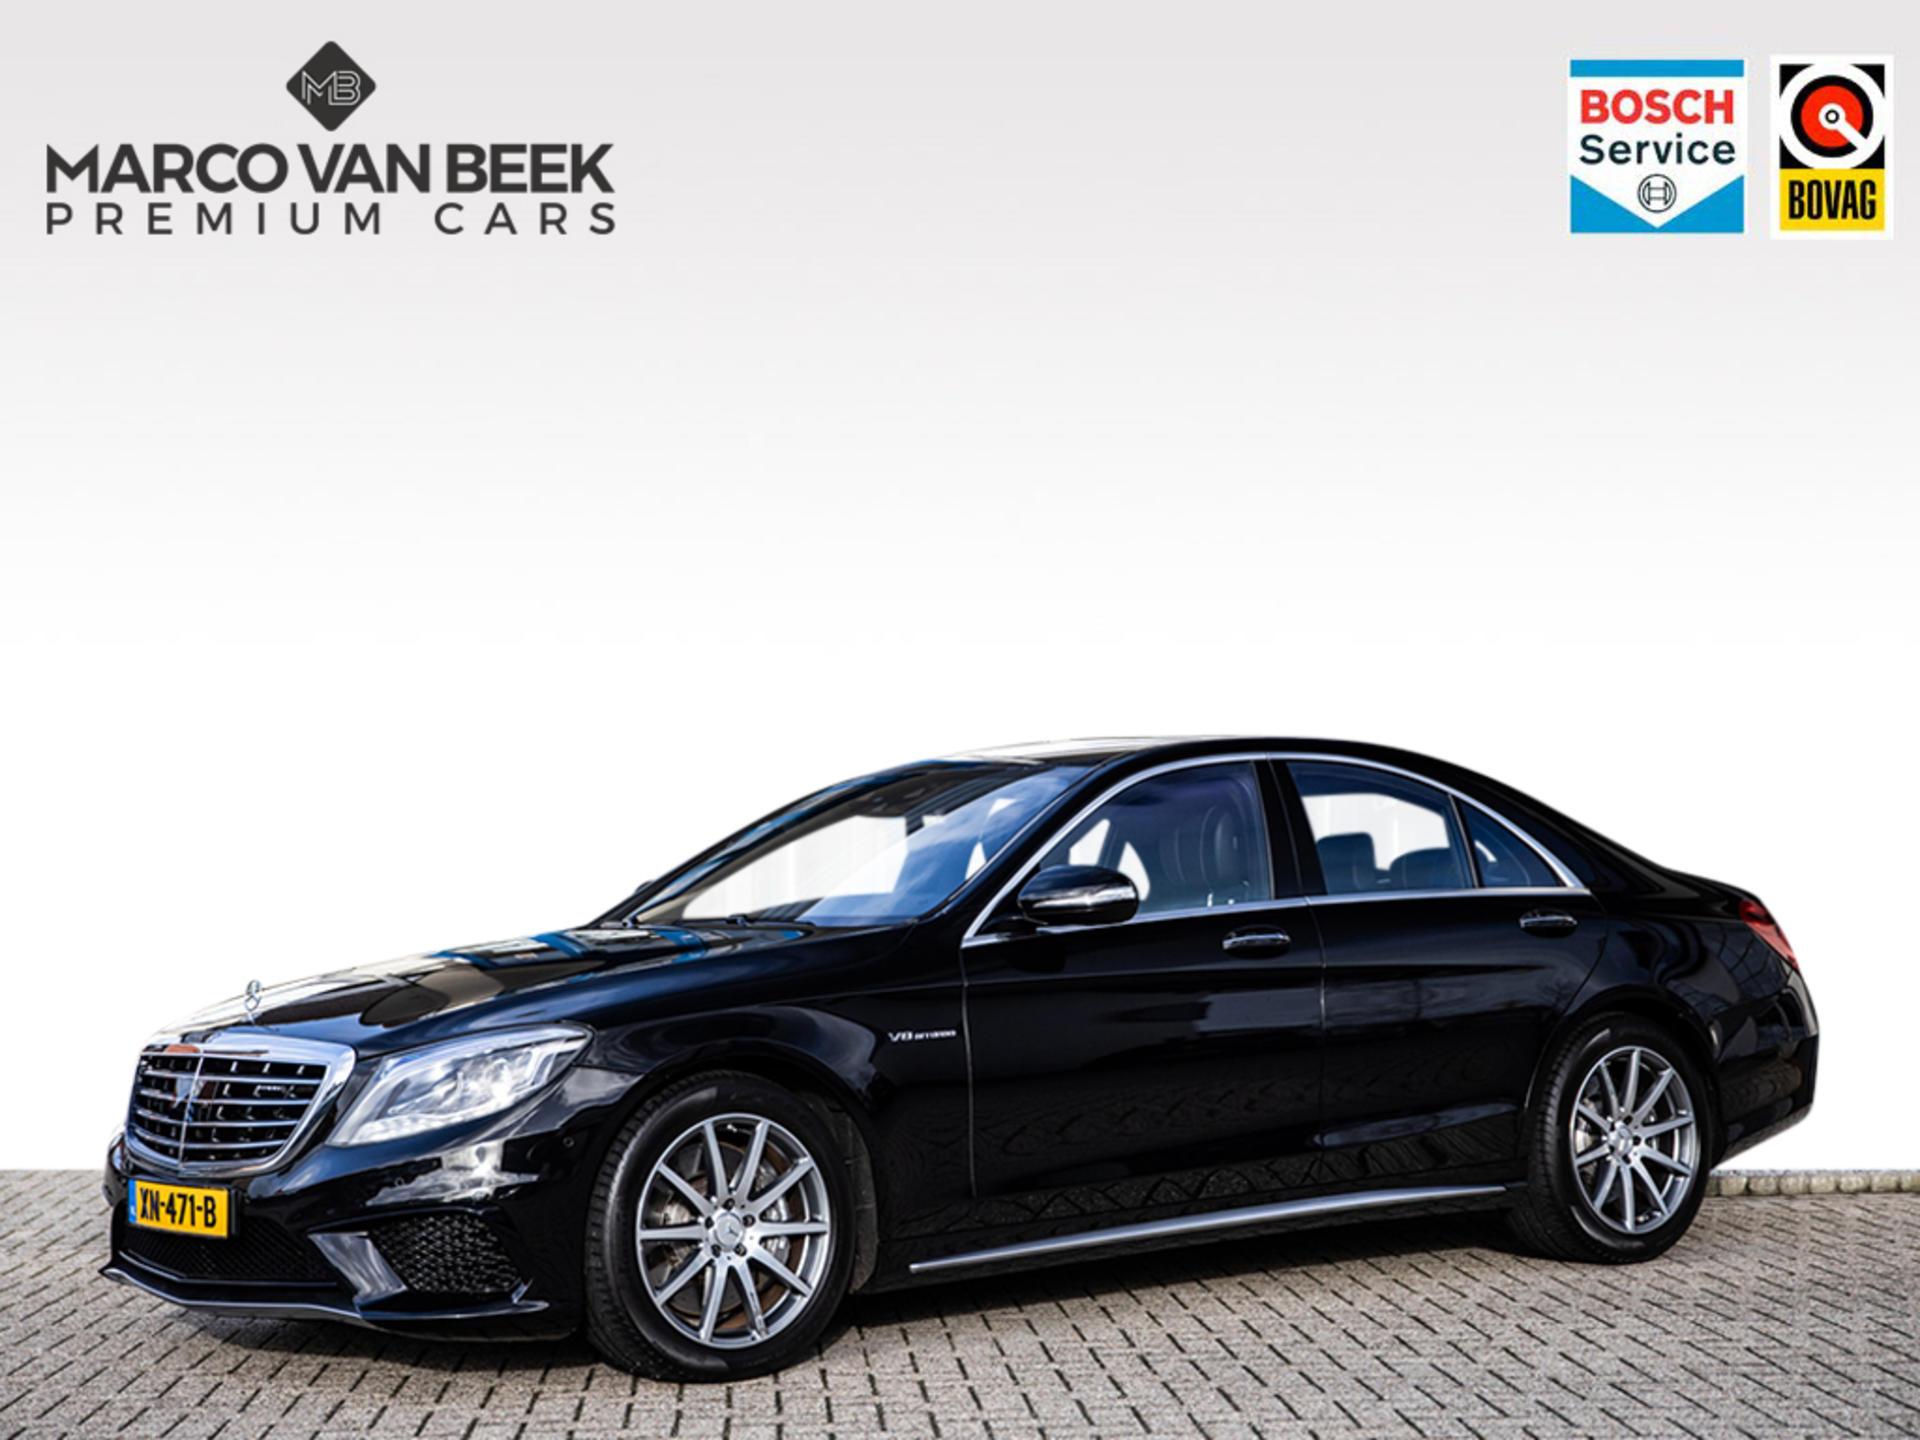 Mercedes-benz S-klasse S 63 amg keyless distronic comand nw.pr. € 205.161